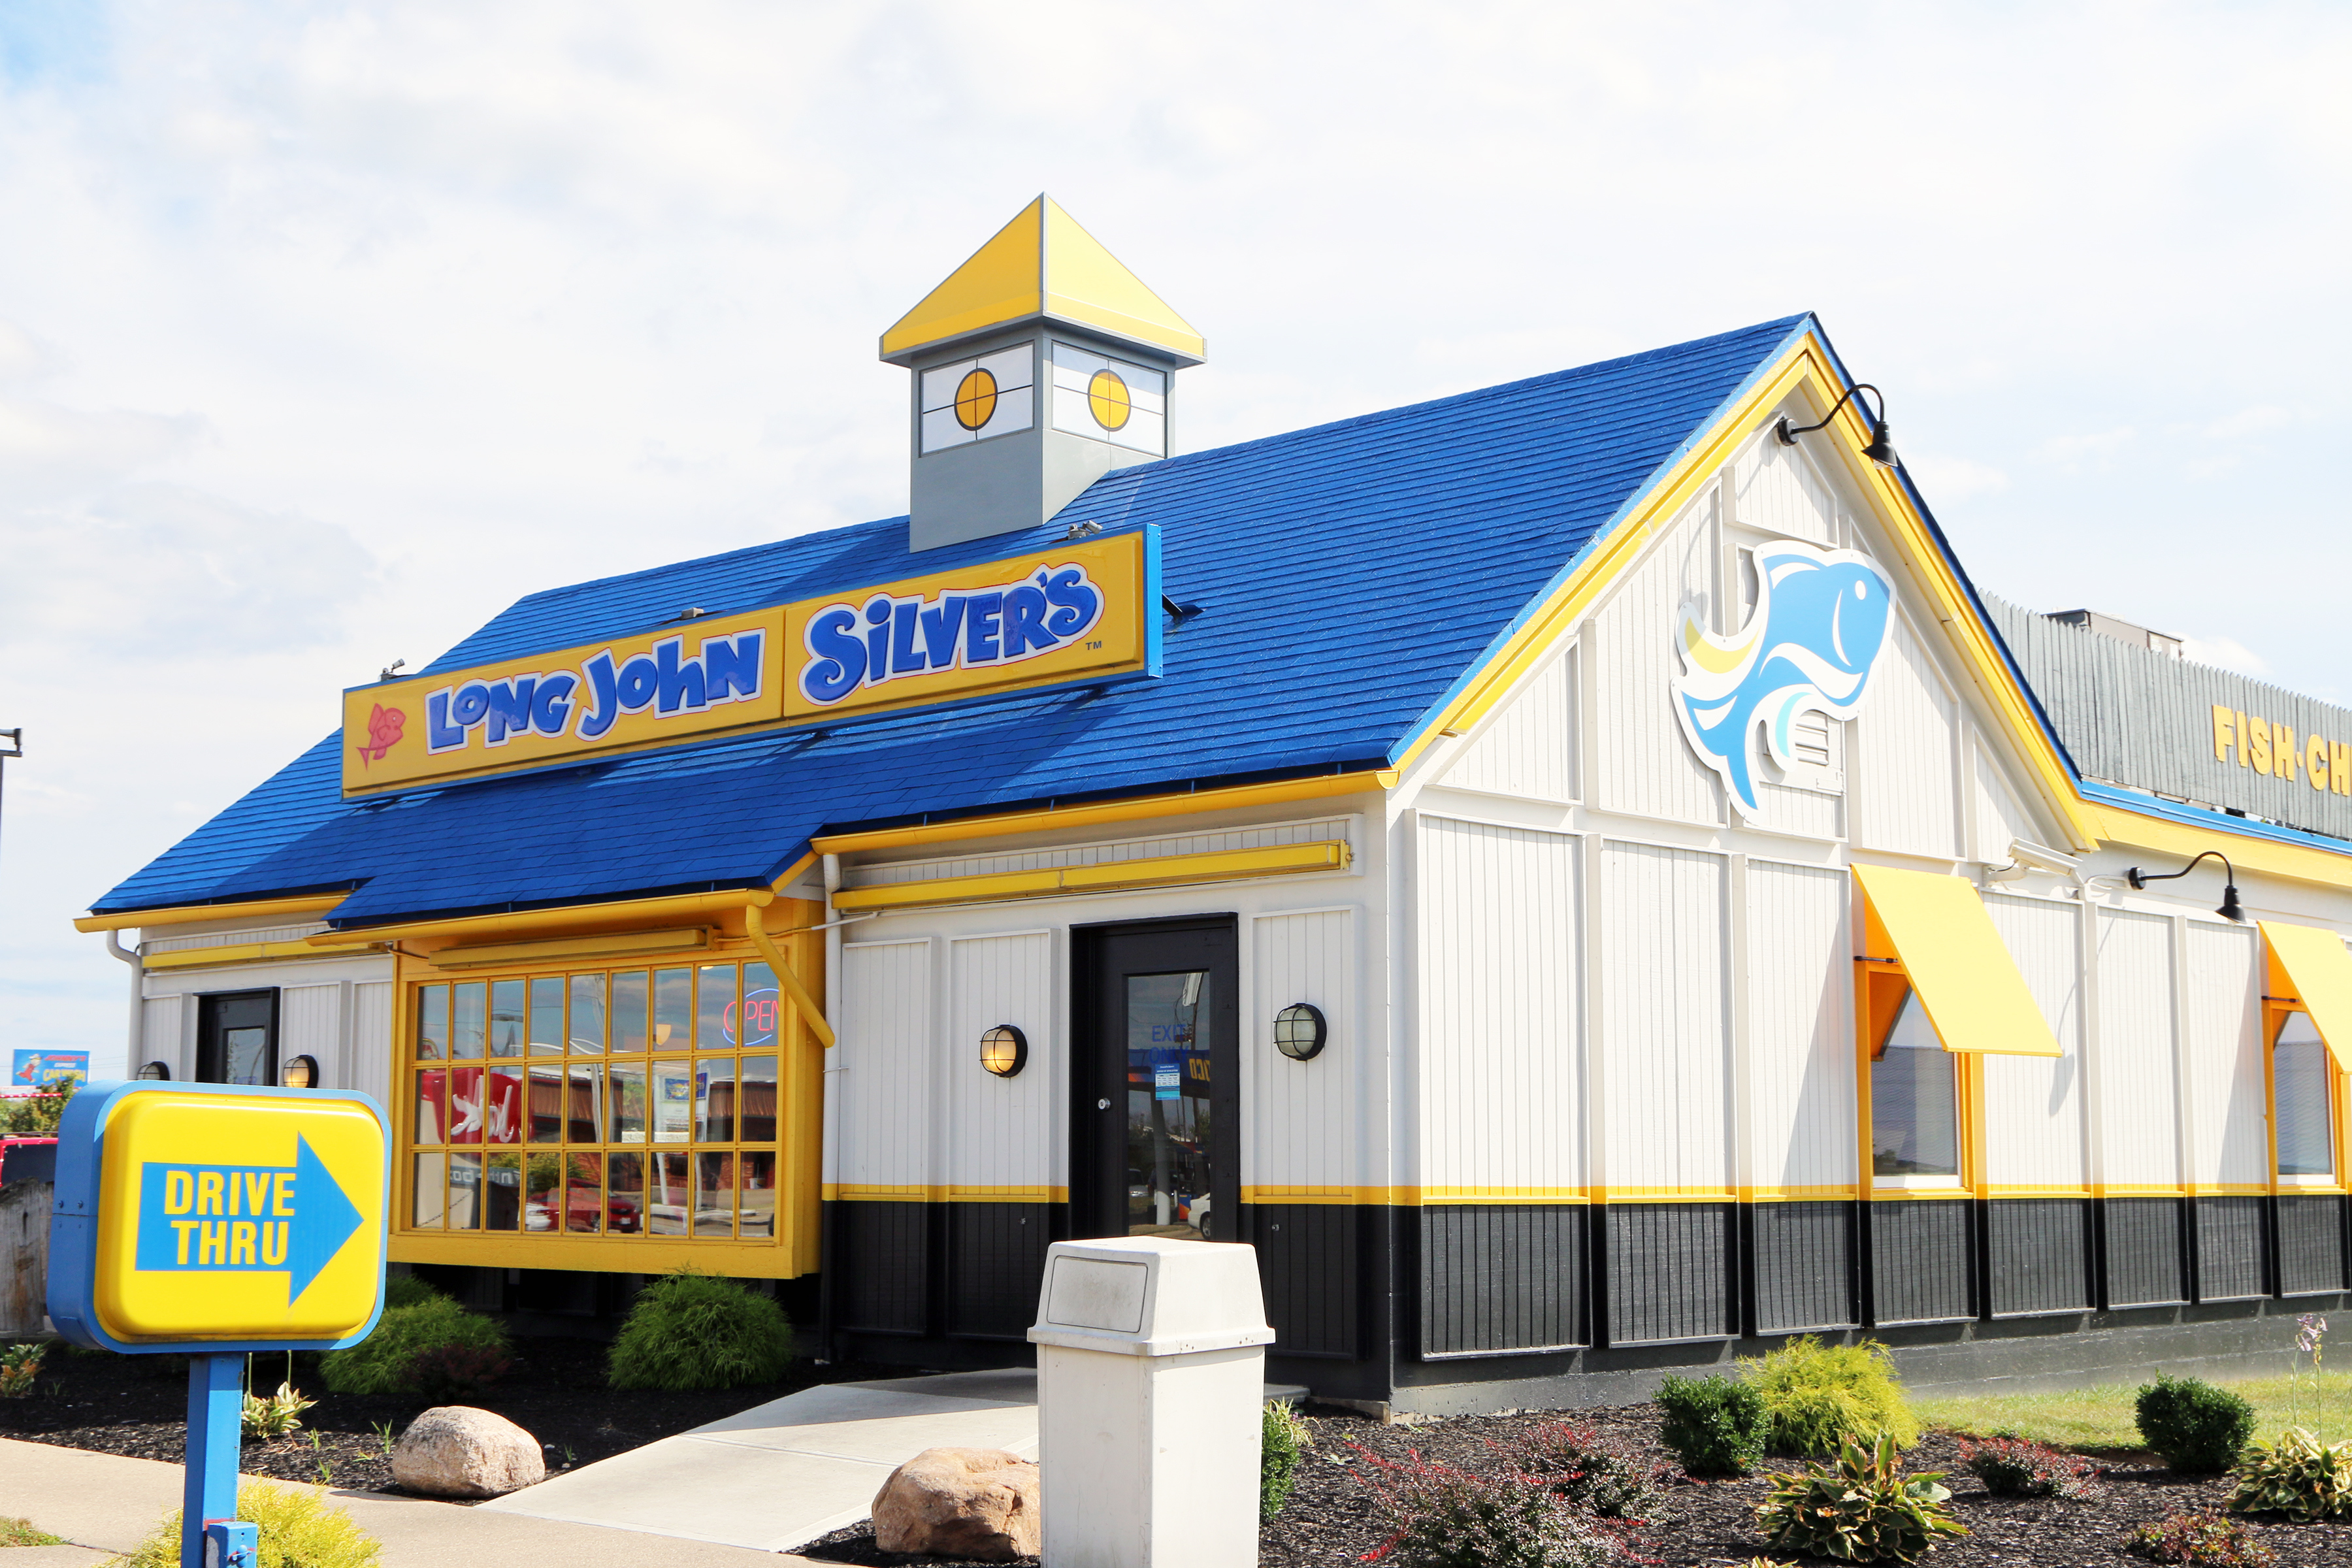 Long John Silver's seafood resaurant